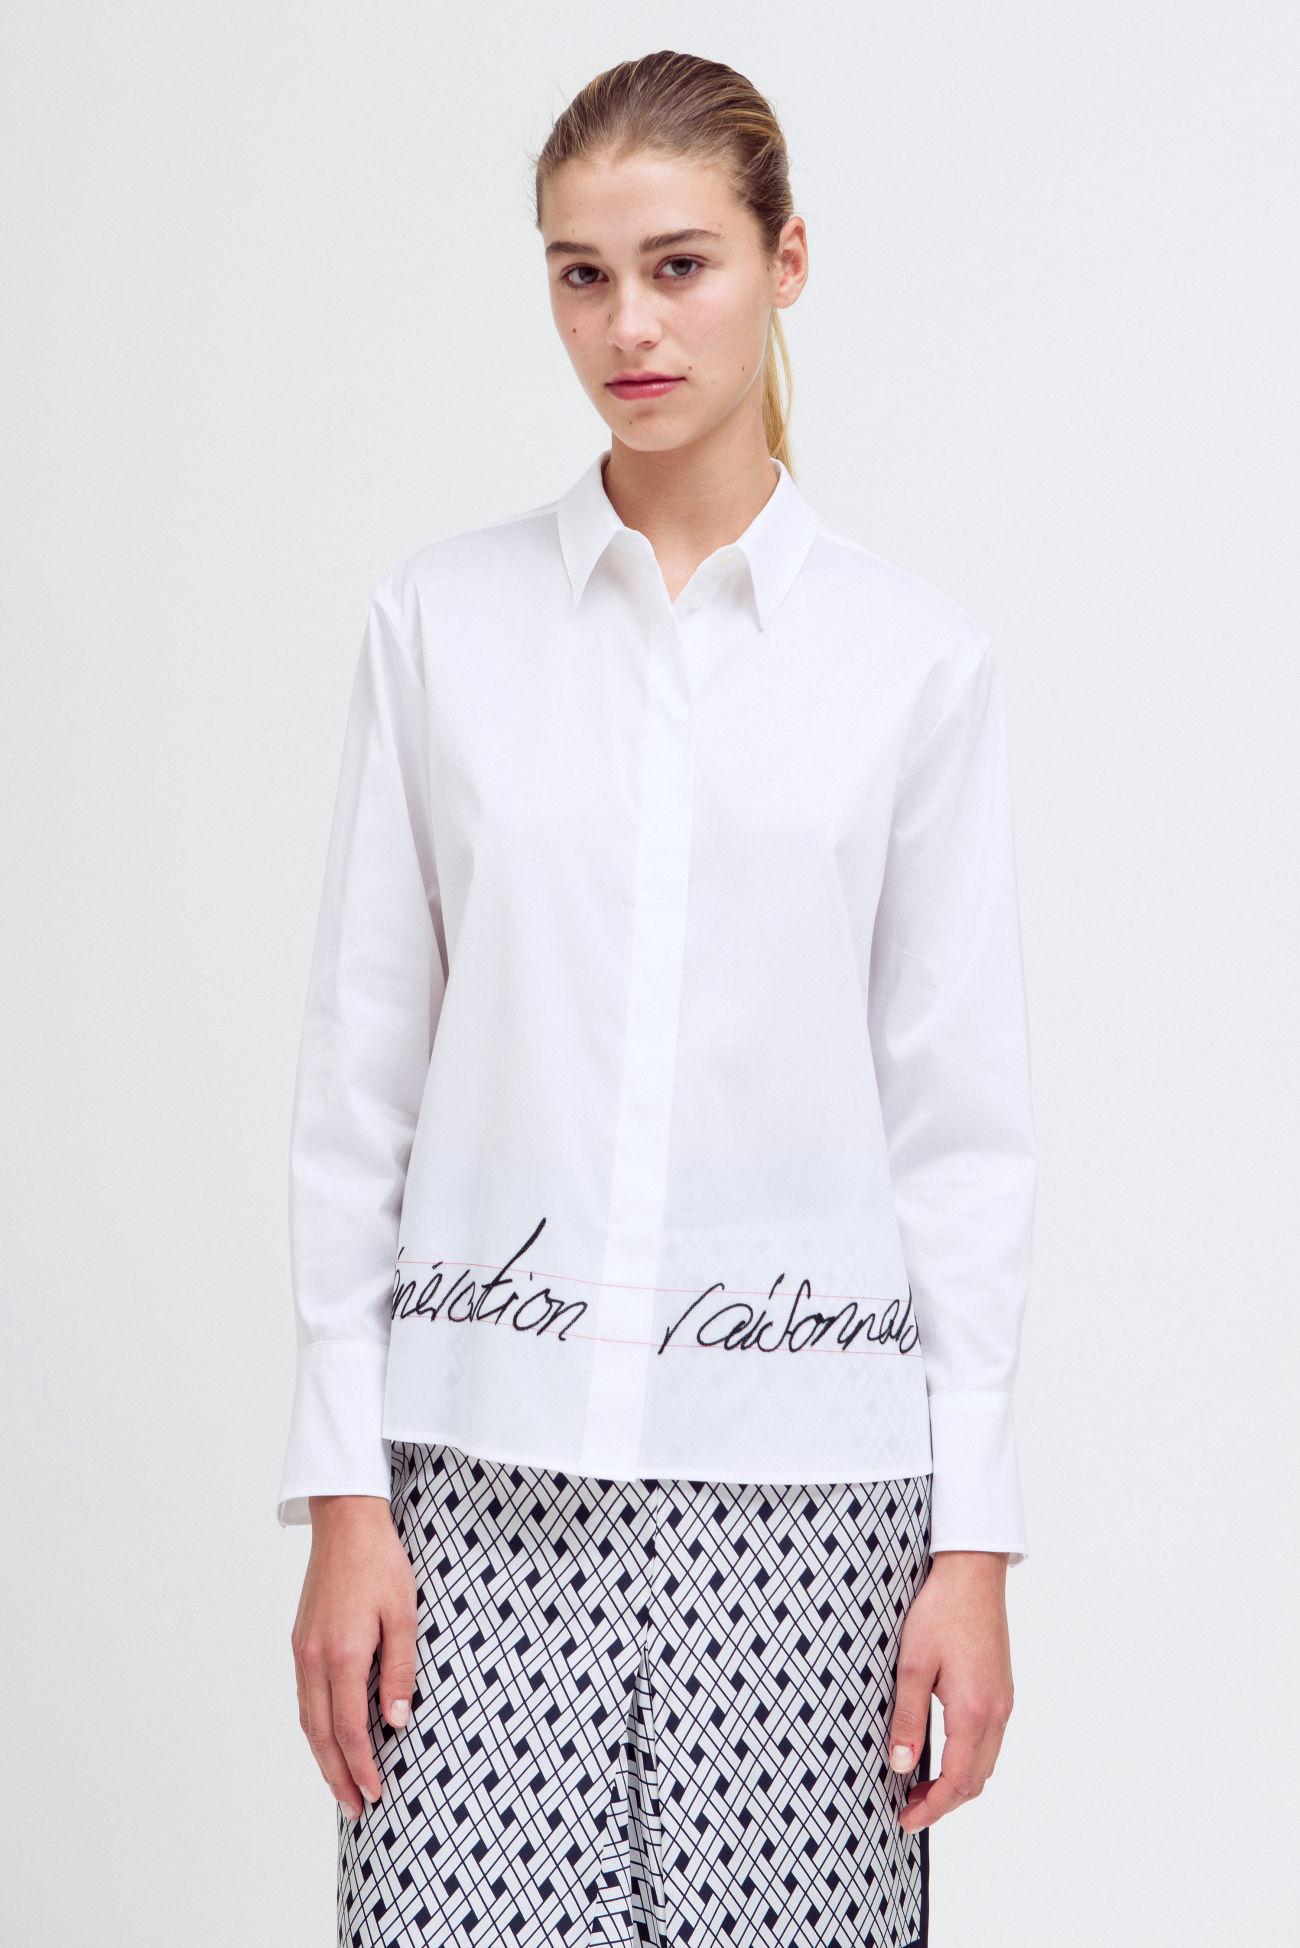 Statement blouse